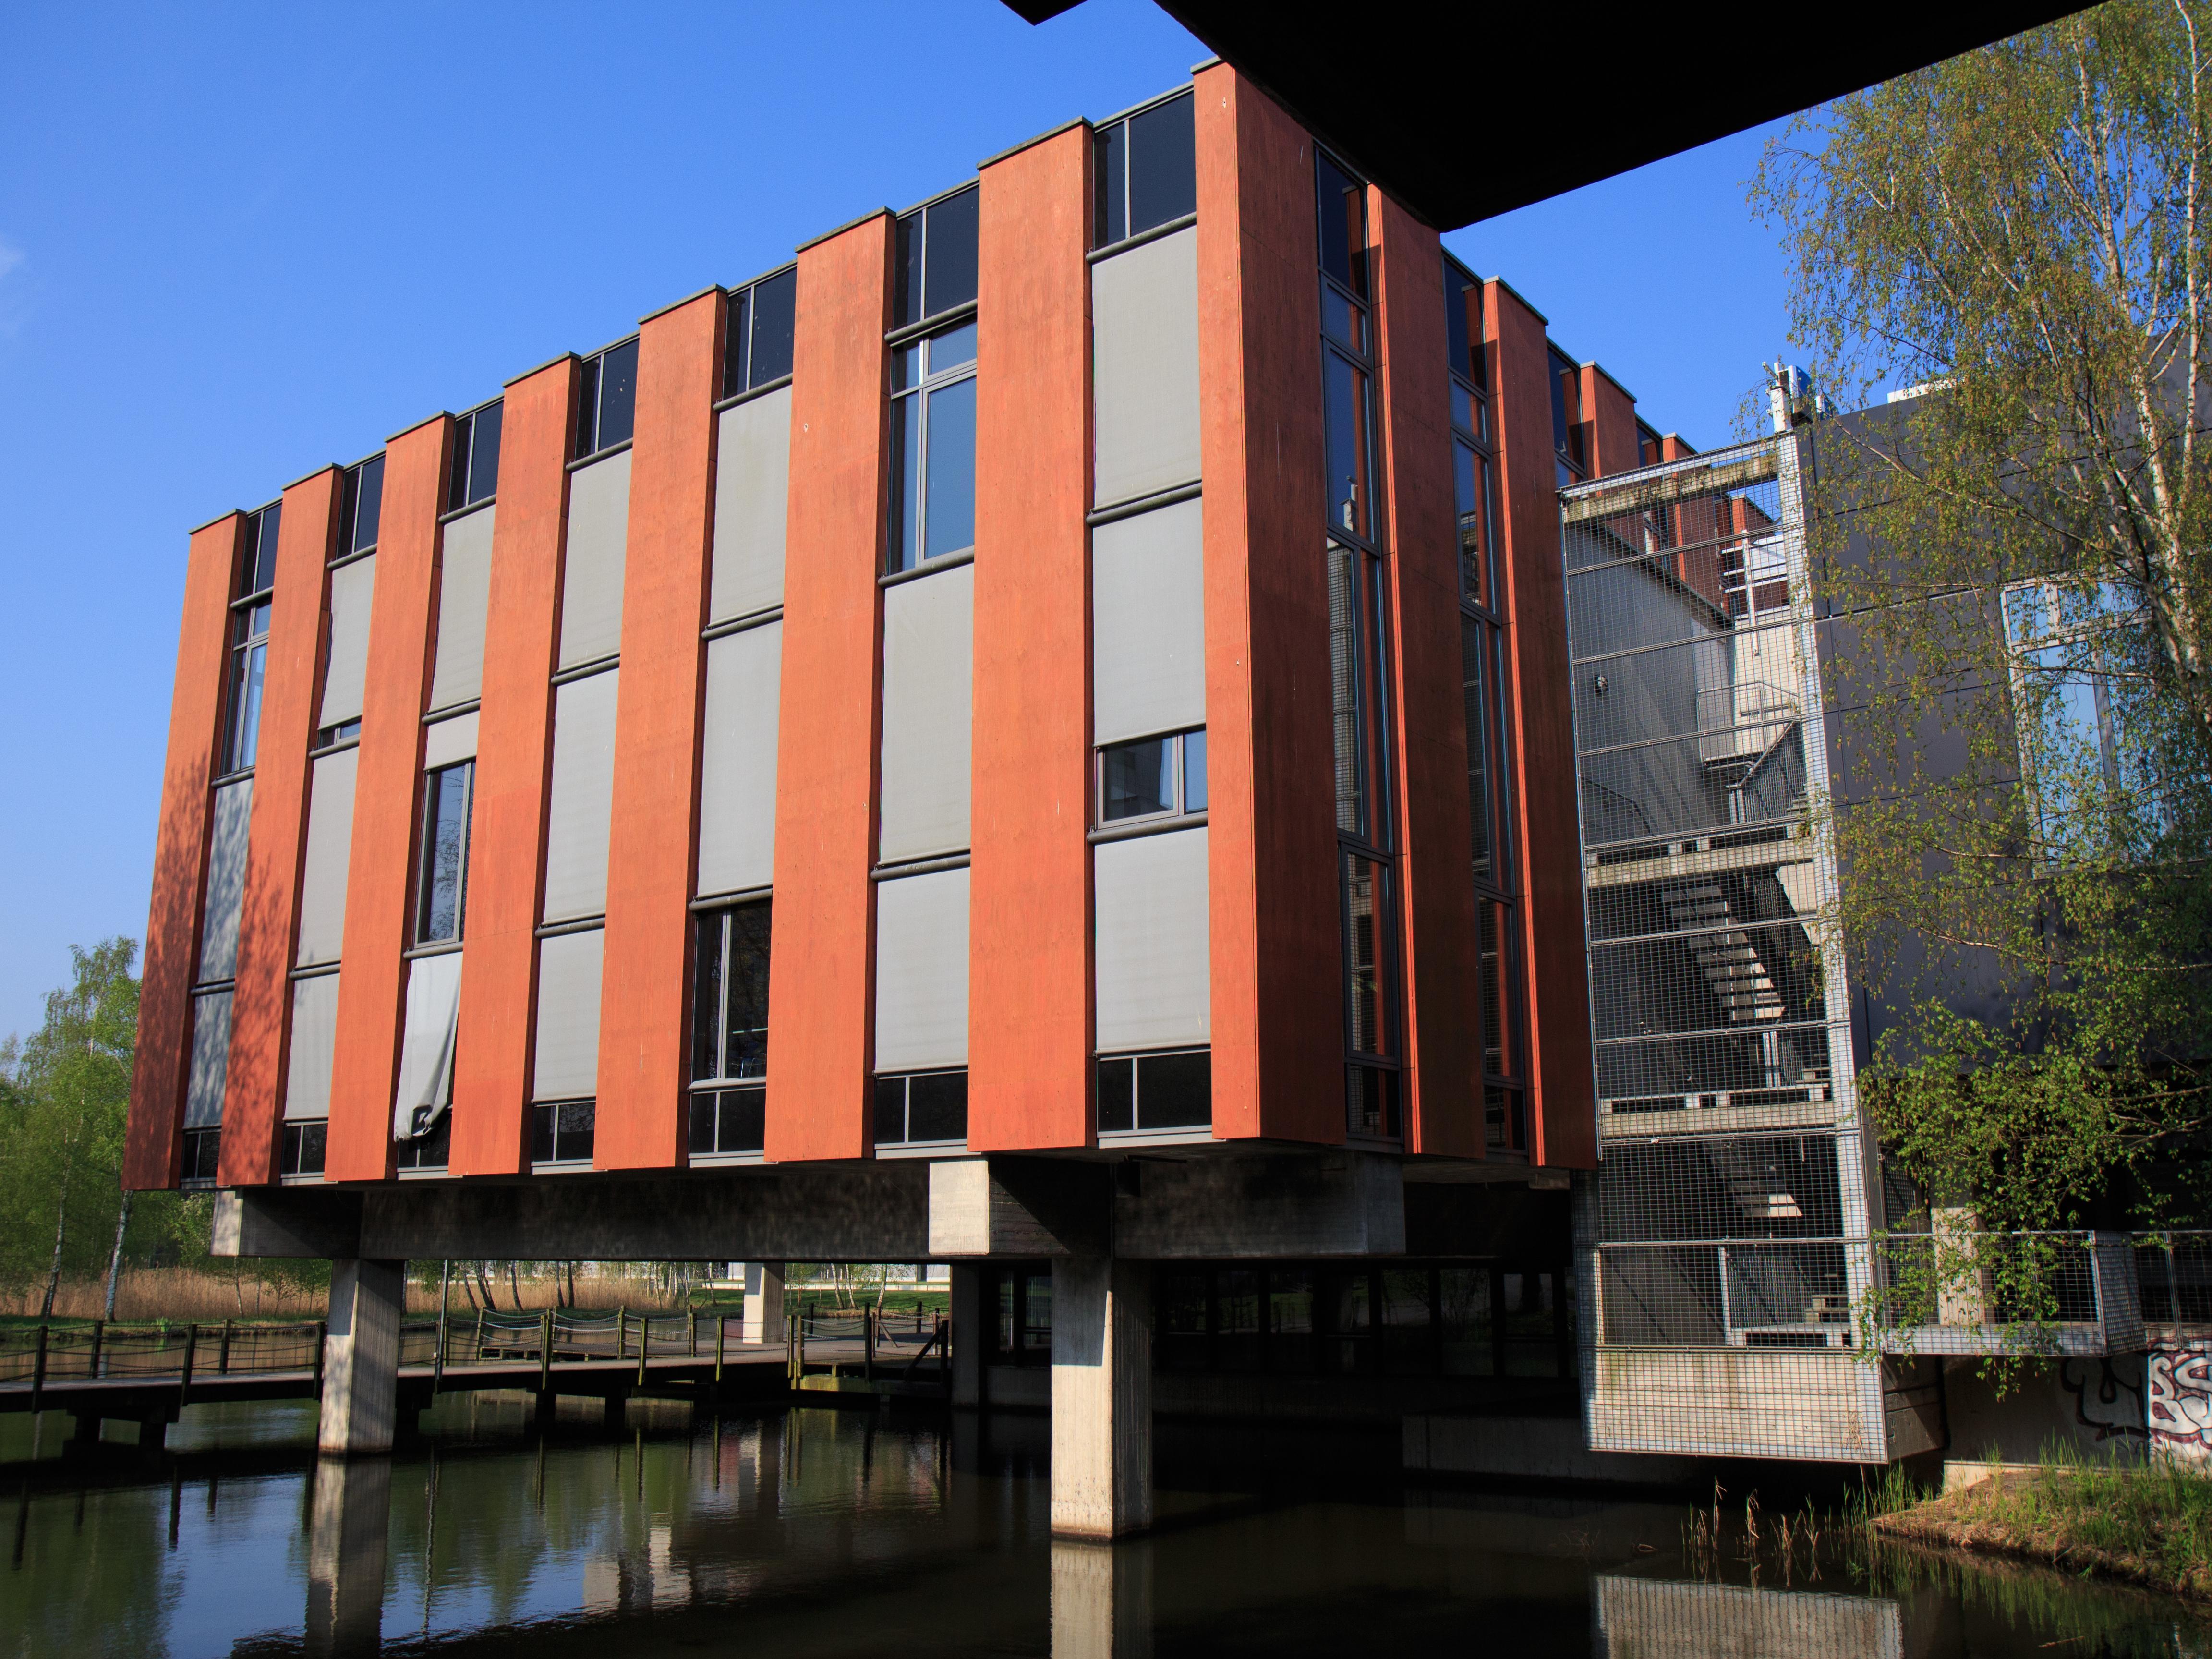 Corona Universitäten Geschlossen